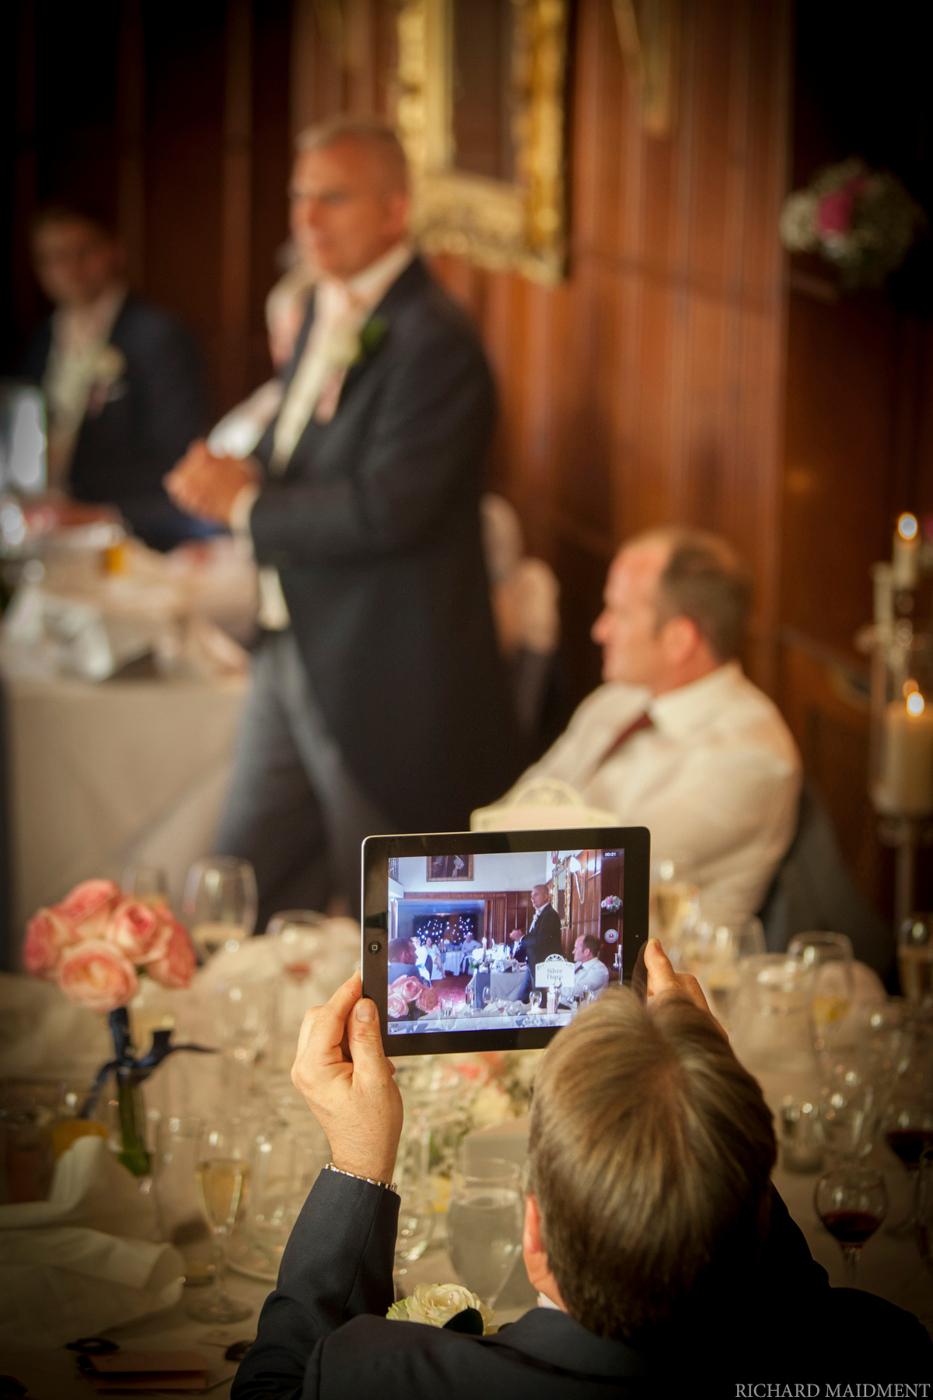 Richard Maidment - Wedding Photography (66).jpg